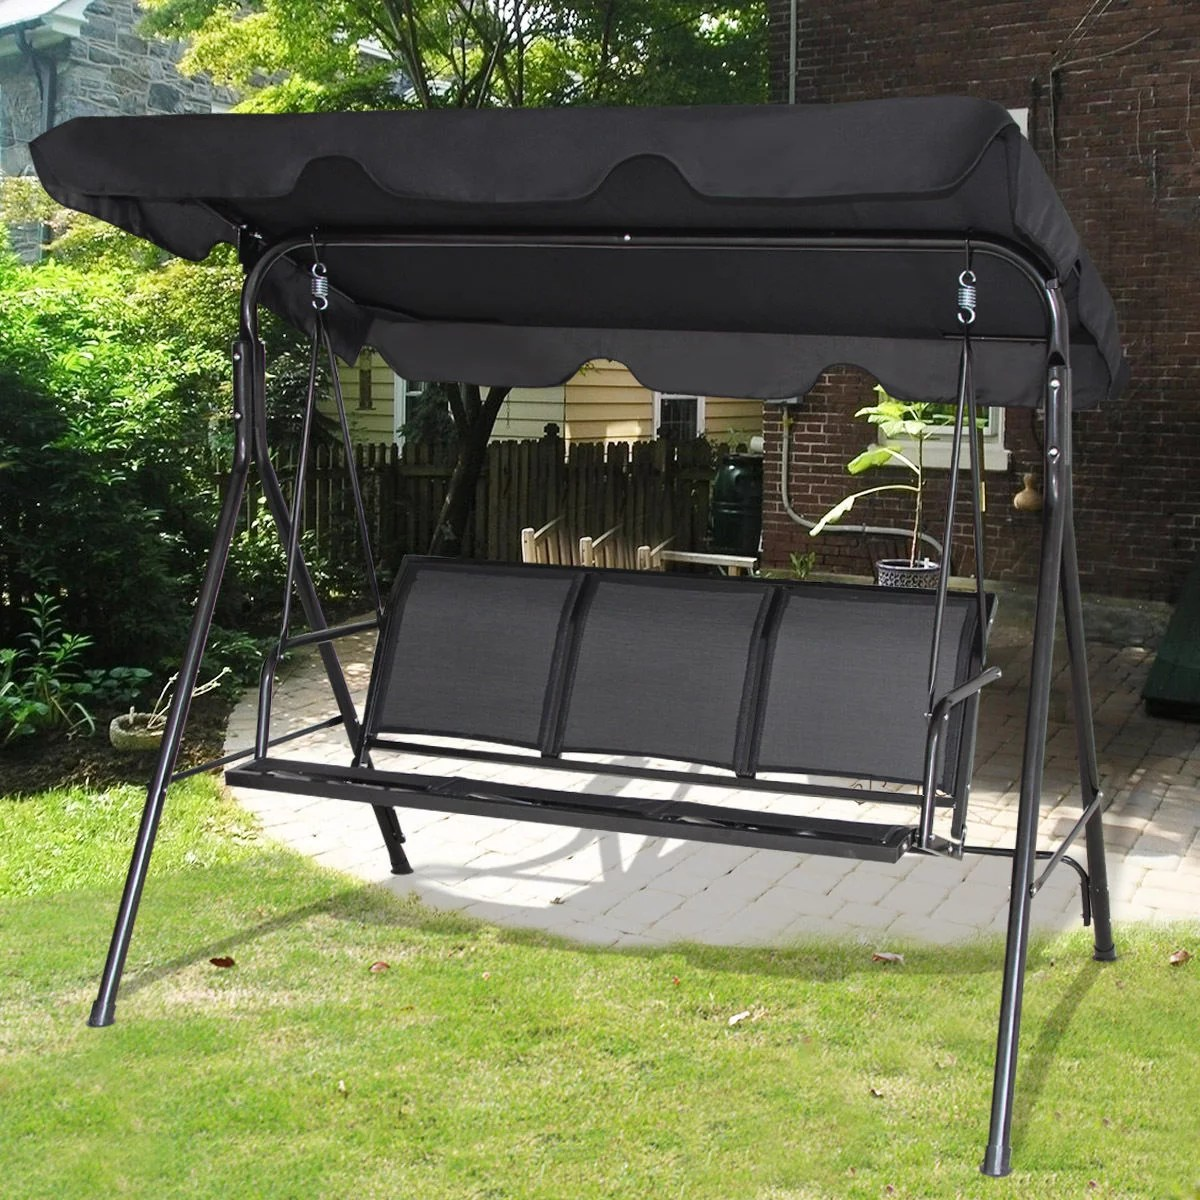 gymax black outdoor swing canopy patio swing chair 3 person canopy hammock walmart com